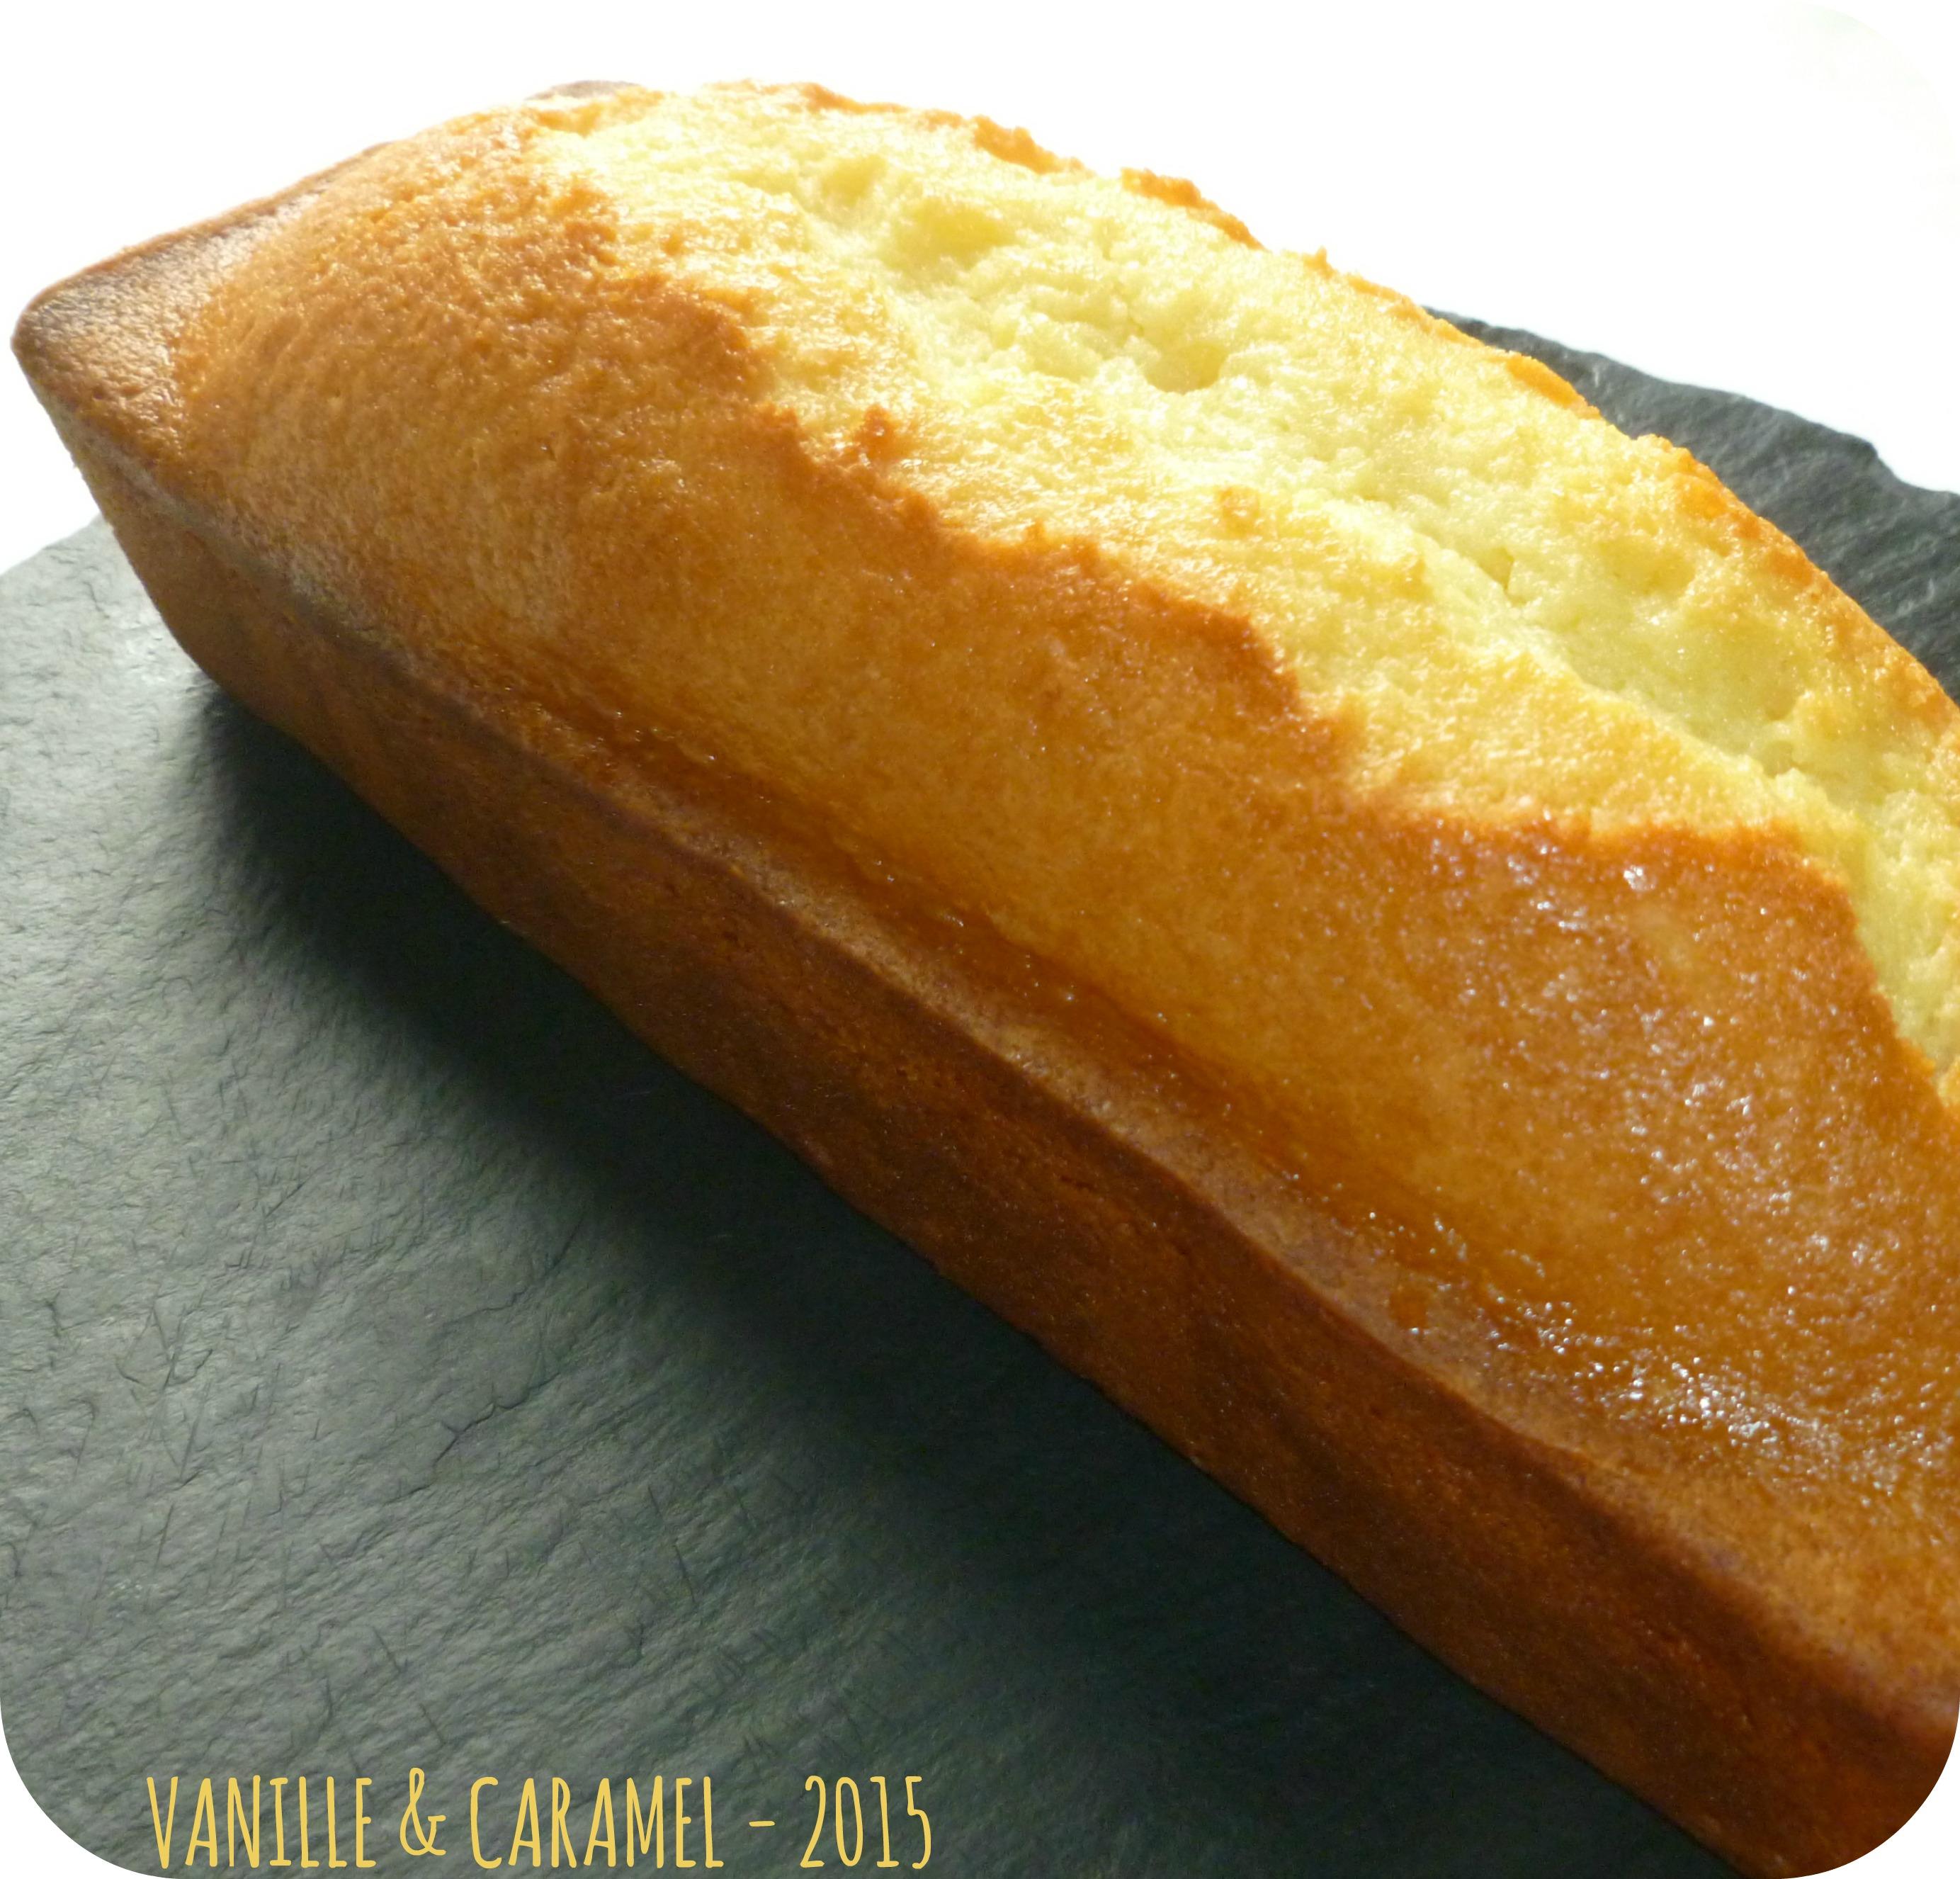 Cake au citron recette de pierre herm vanille caramel for Cake au chocolat pierre herme